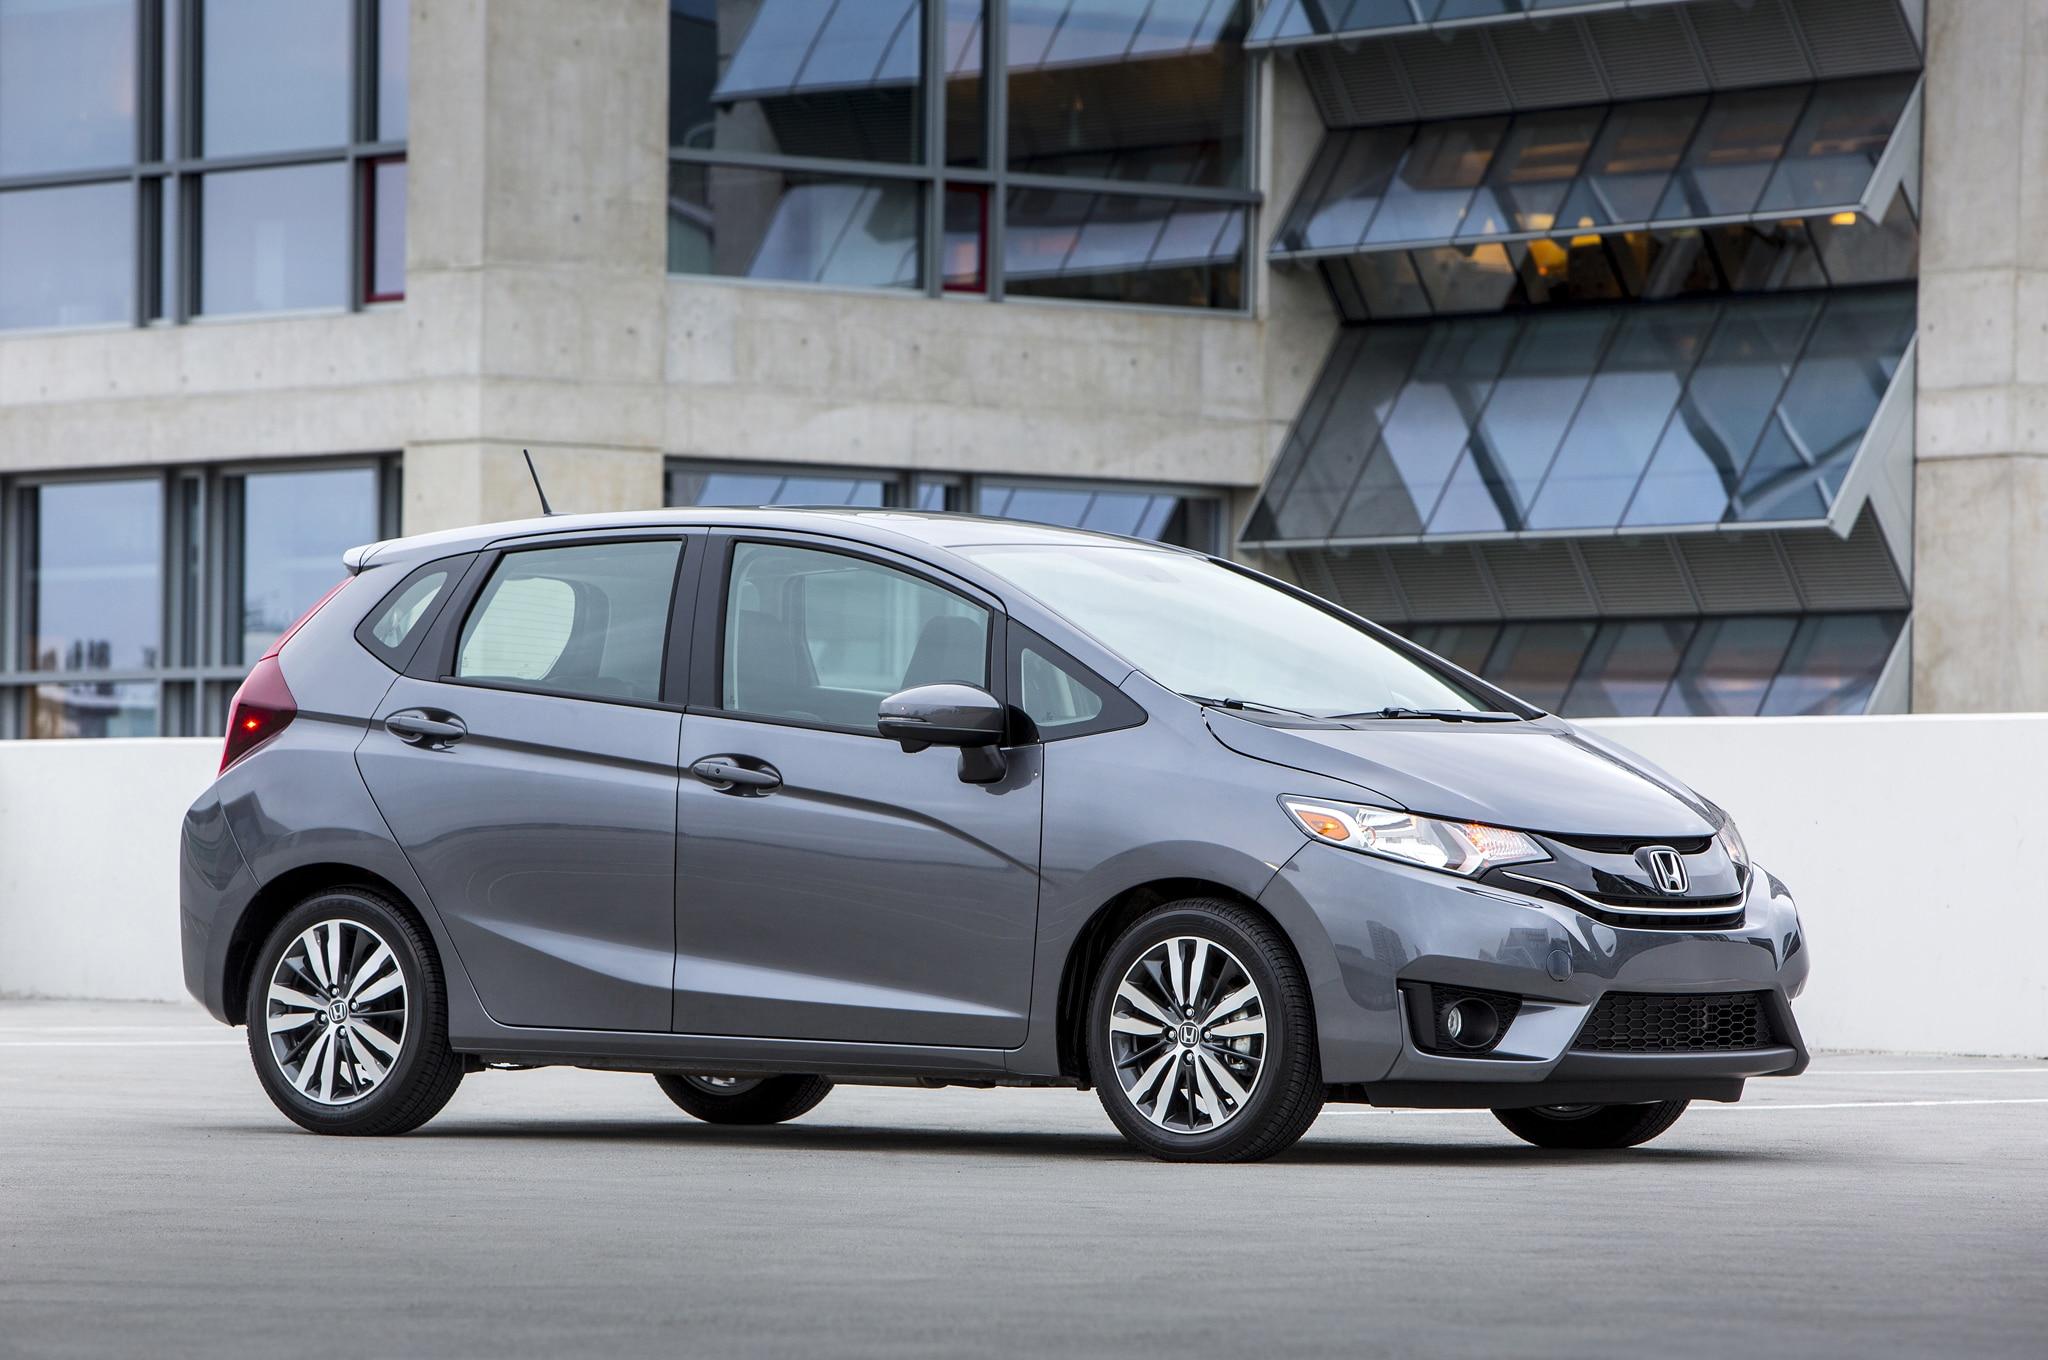 2015 Honda Fit Side Profile3